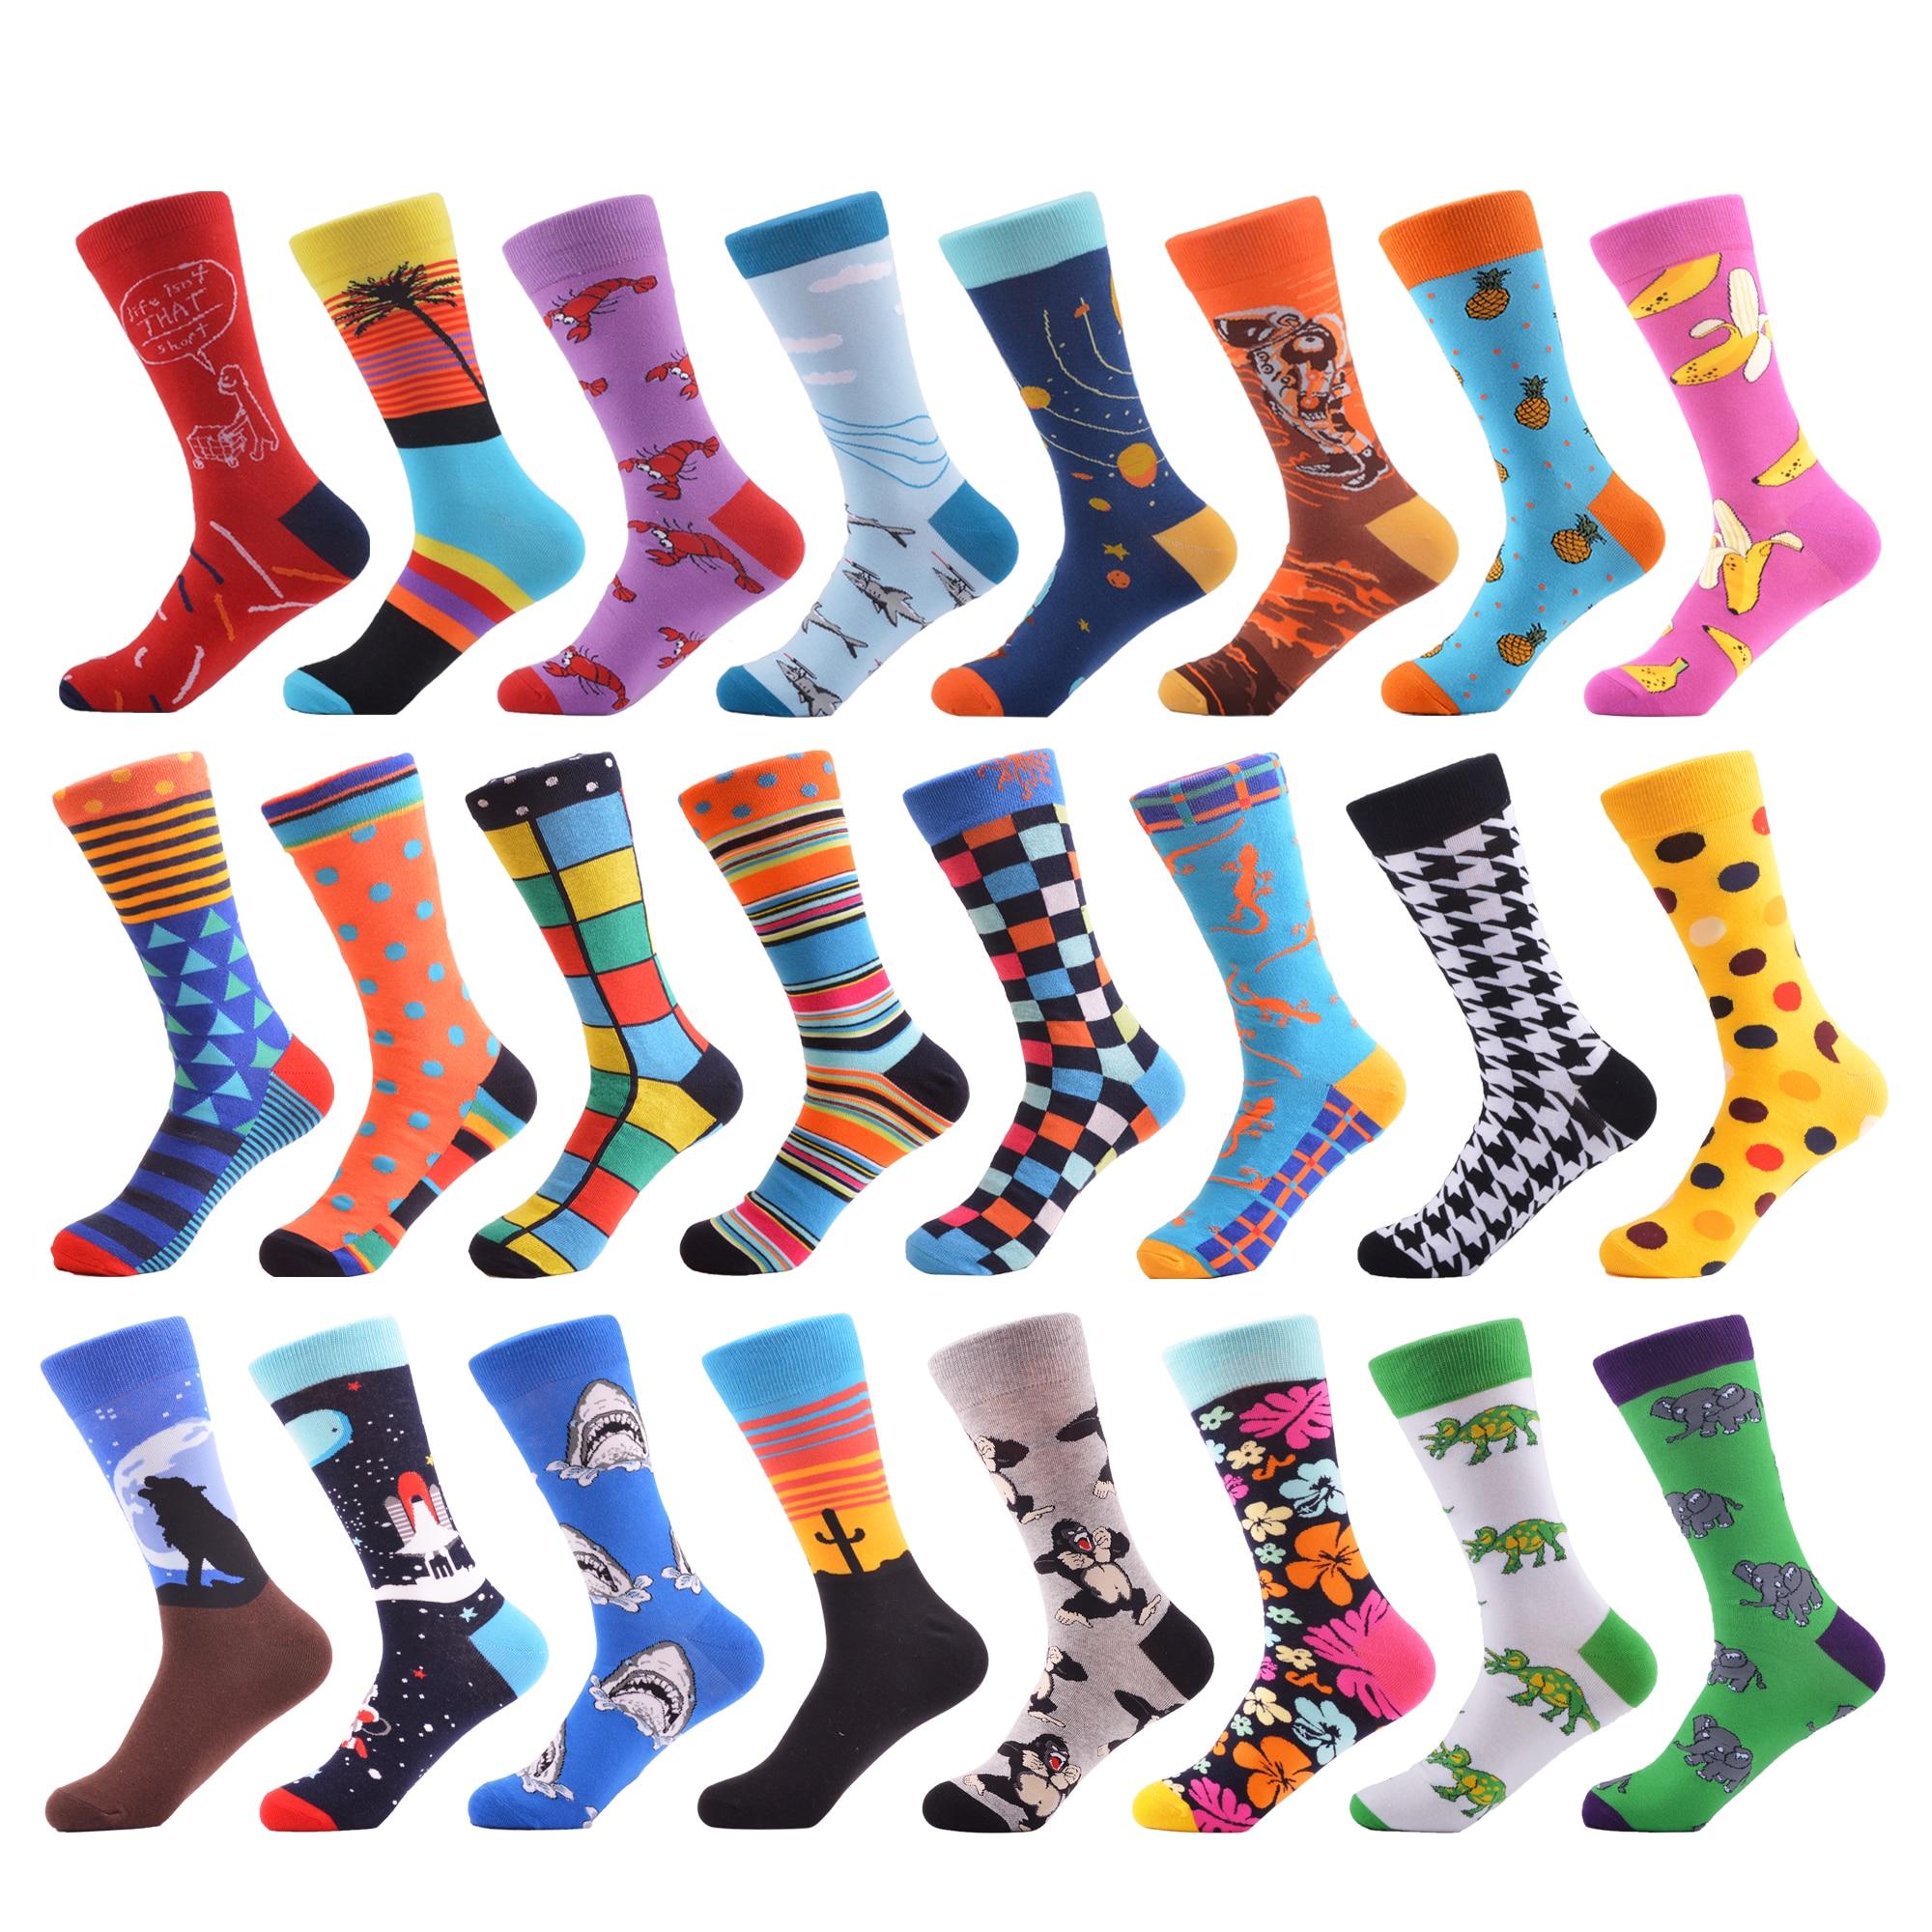 SANZETTI 1 Pair 2019 Newest Men's Colorful Comfortable Causal Dress Skateboard   Socks   Shark Geometry Pattern Funny Wedding   Socks